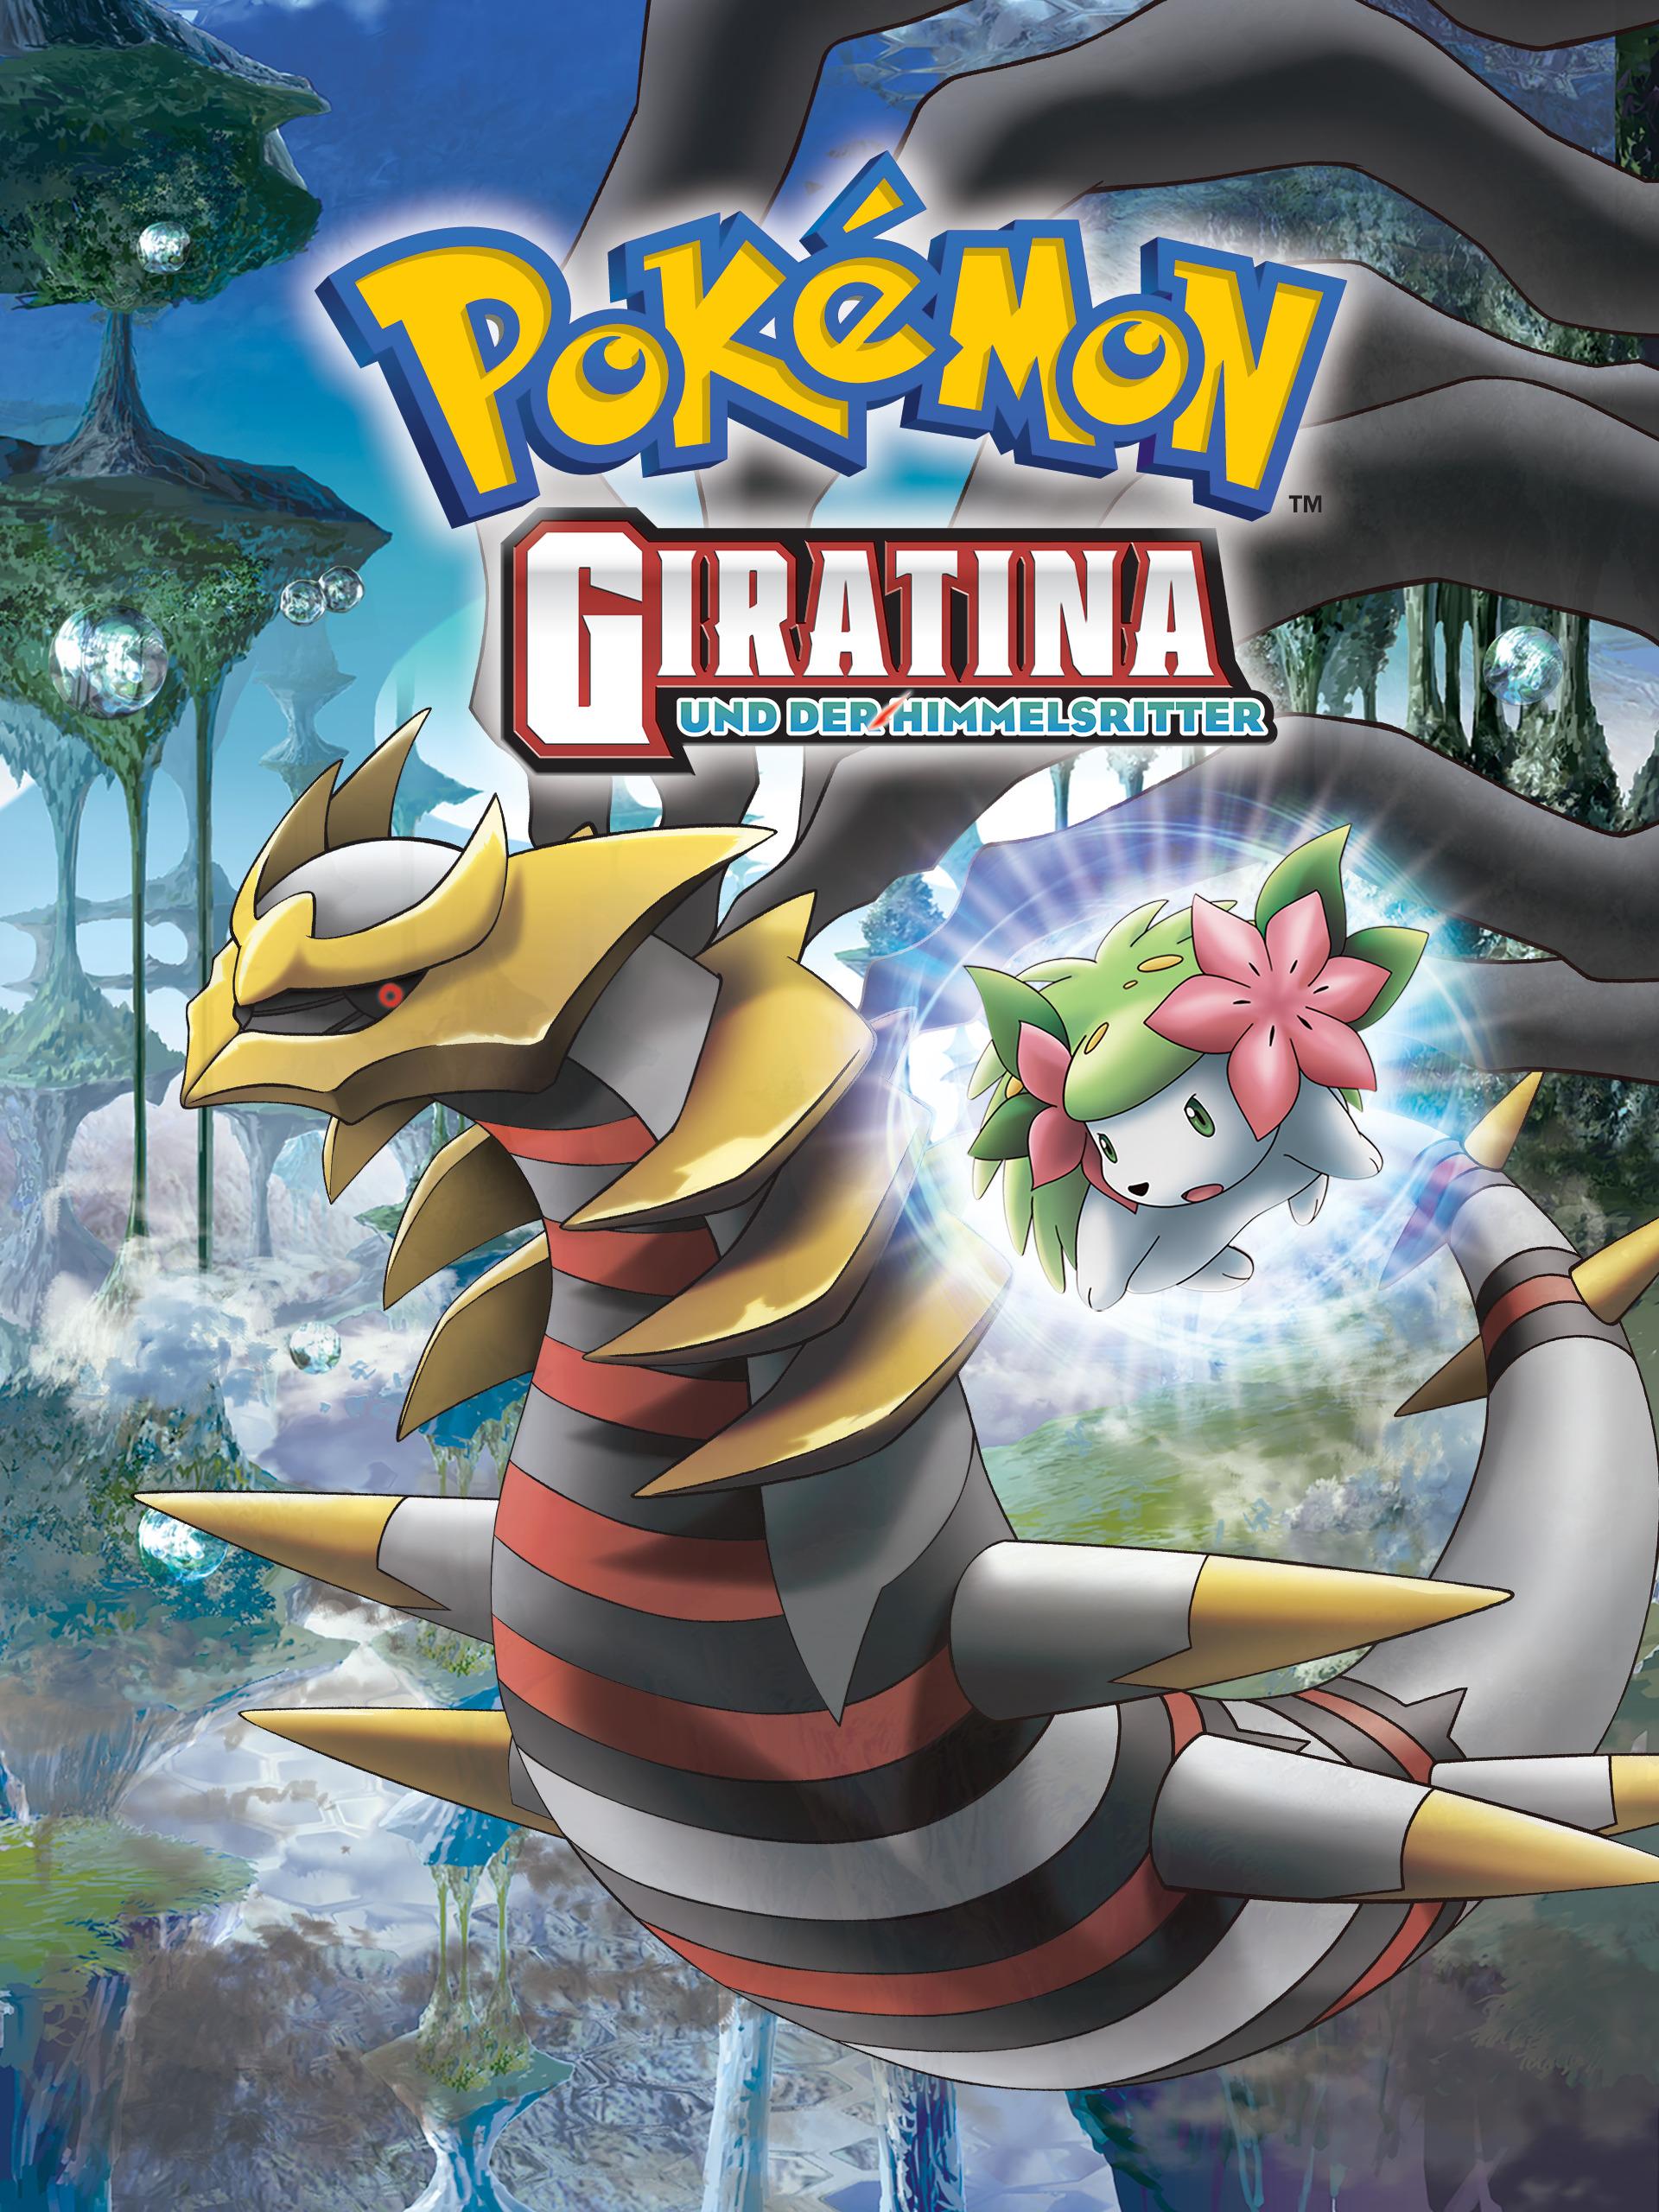 Pokémon 11: Giratina und der Himmelsritter